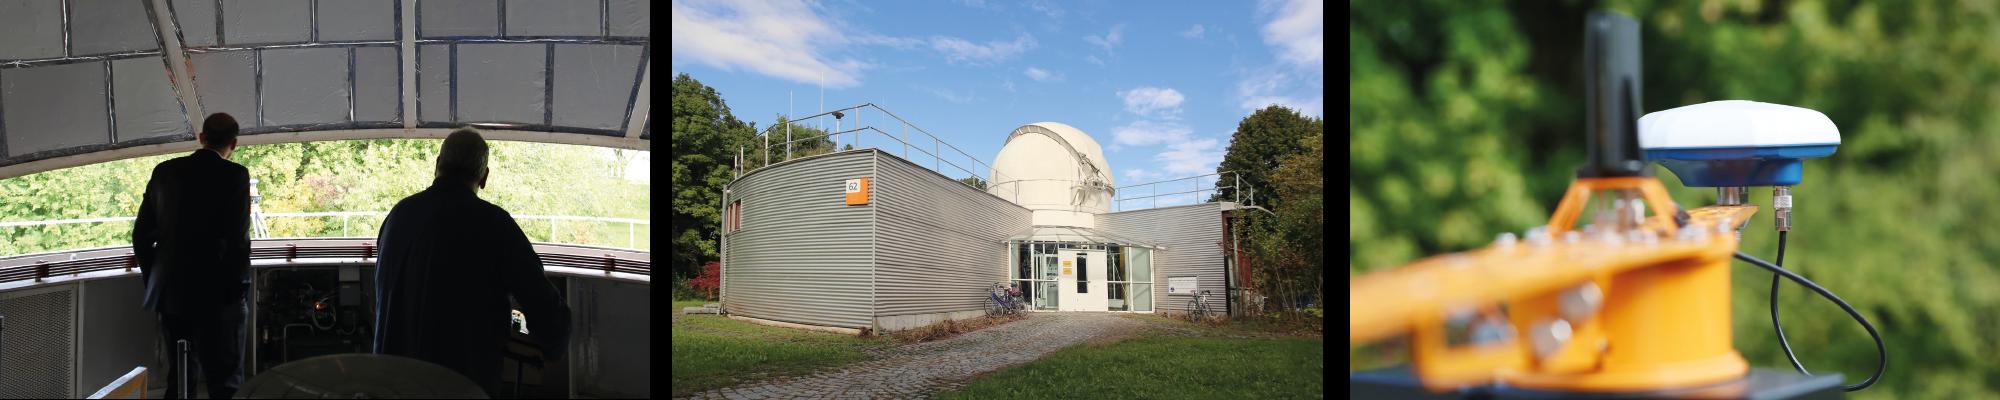 SPACE – Forschungsschwerpunkt Satellitennavigation